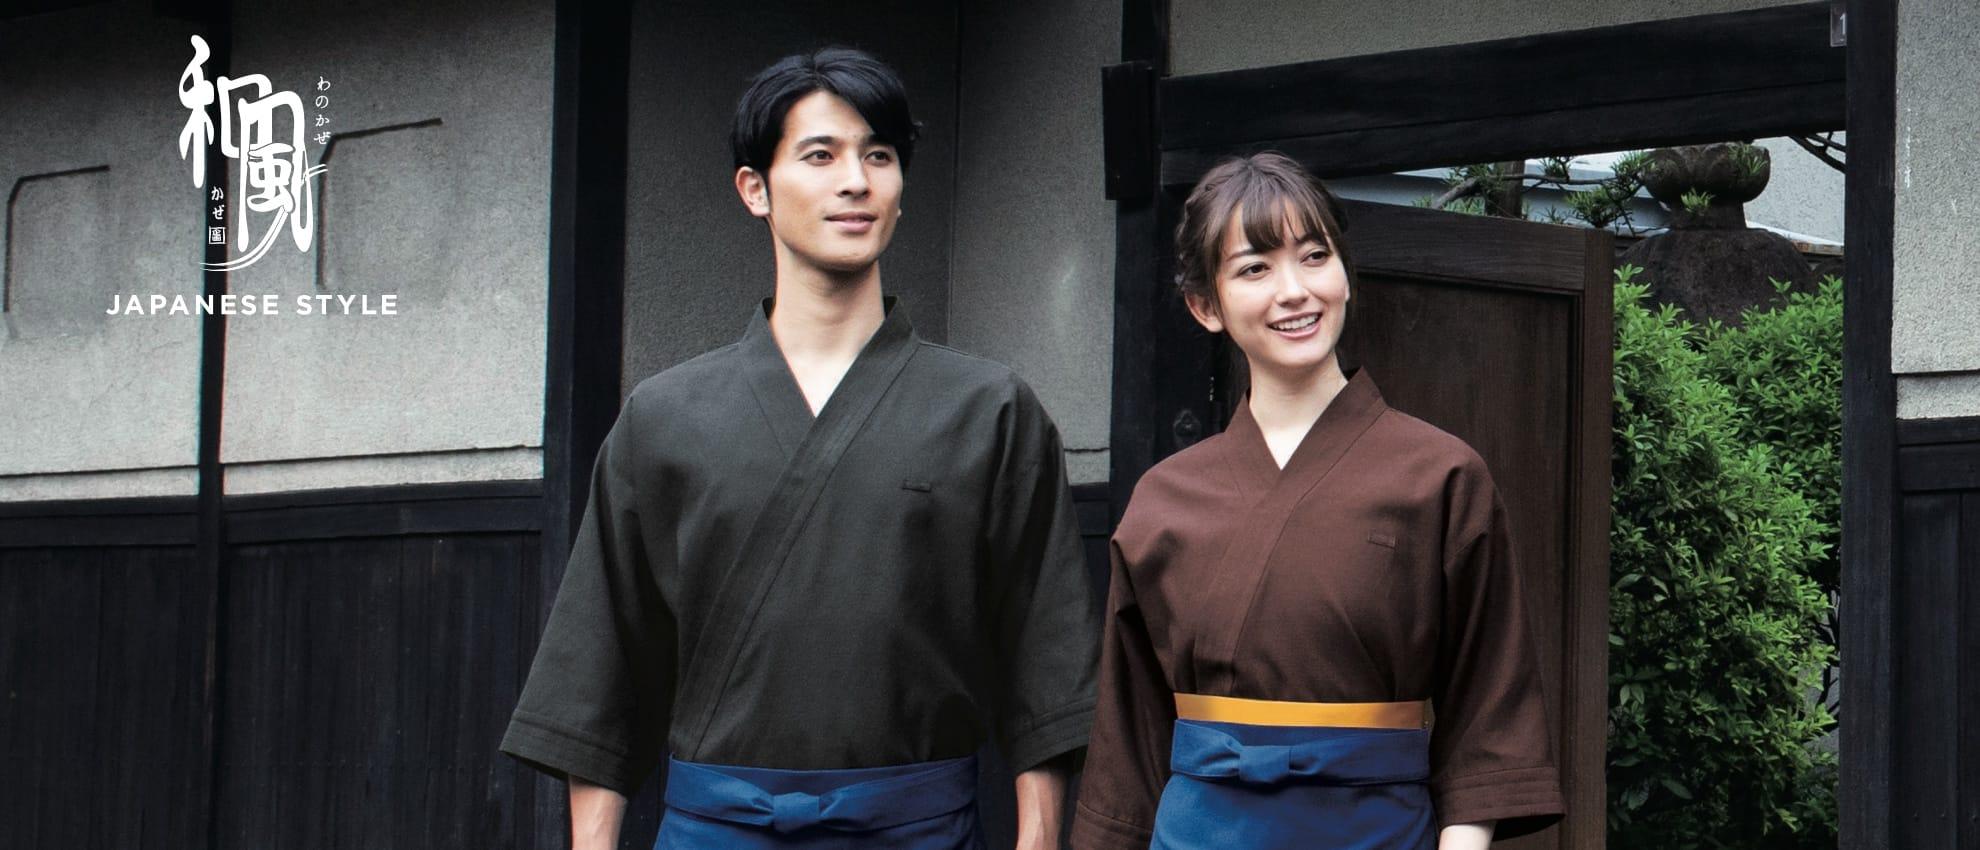 Boston-Shoki co;Ltd - Bonuni - Wa-no-kaze Modern & Traditional fusion Japanese style uniforms for Japanese restaurants, sake bar, Samue, Maekake apron, Kimono-inspired uniforms, Traditional and modern Japanese style